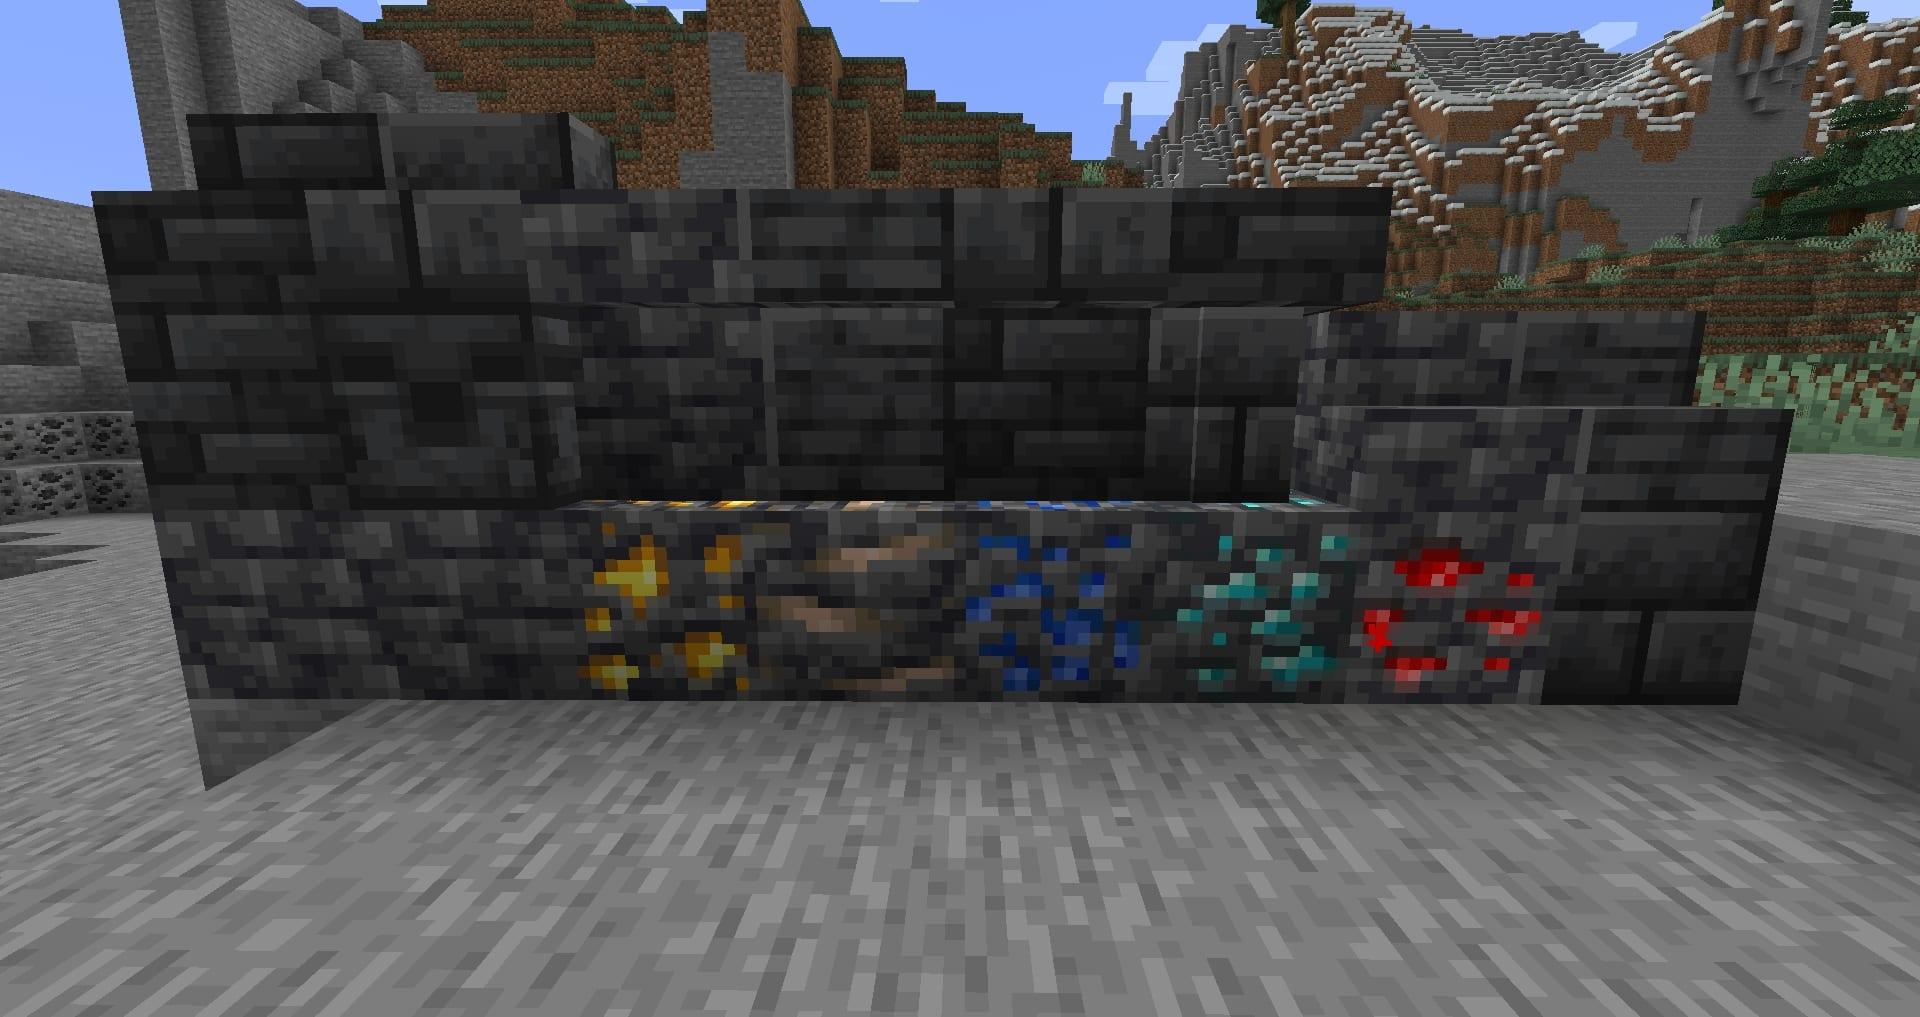 Minecraft 1.17 - DeepSlate